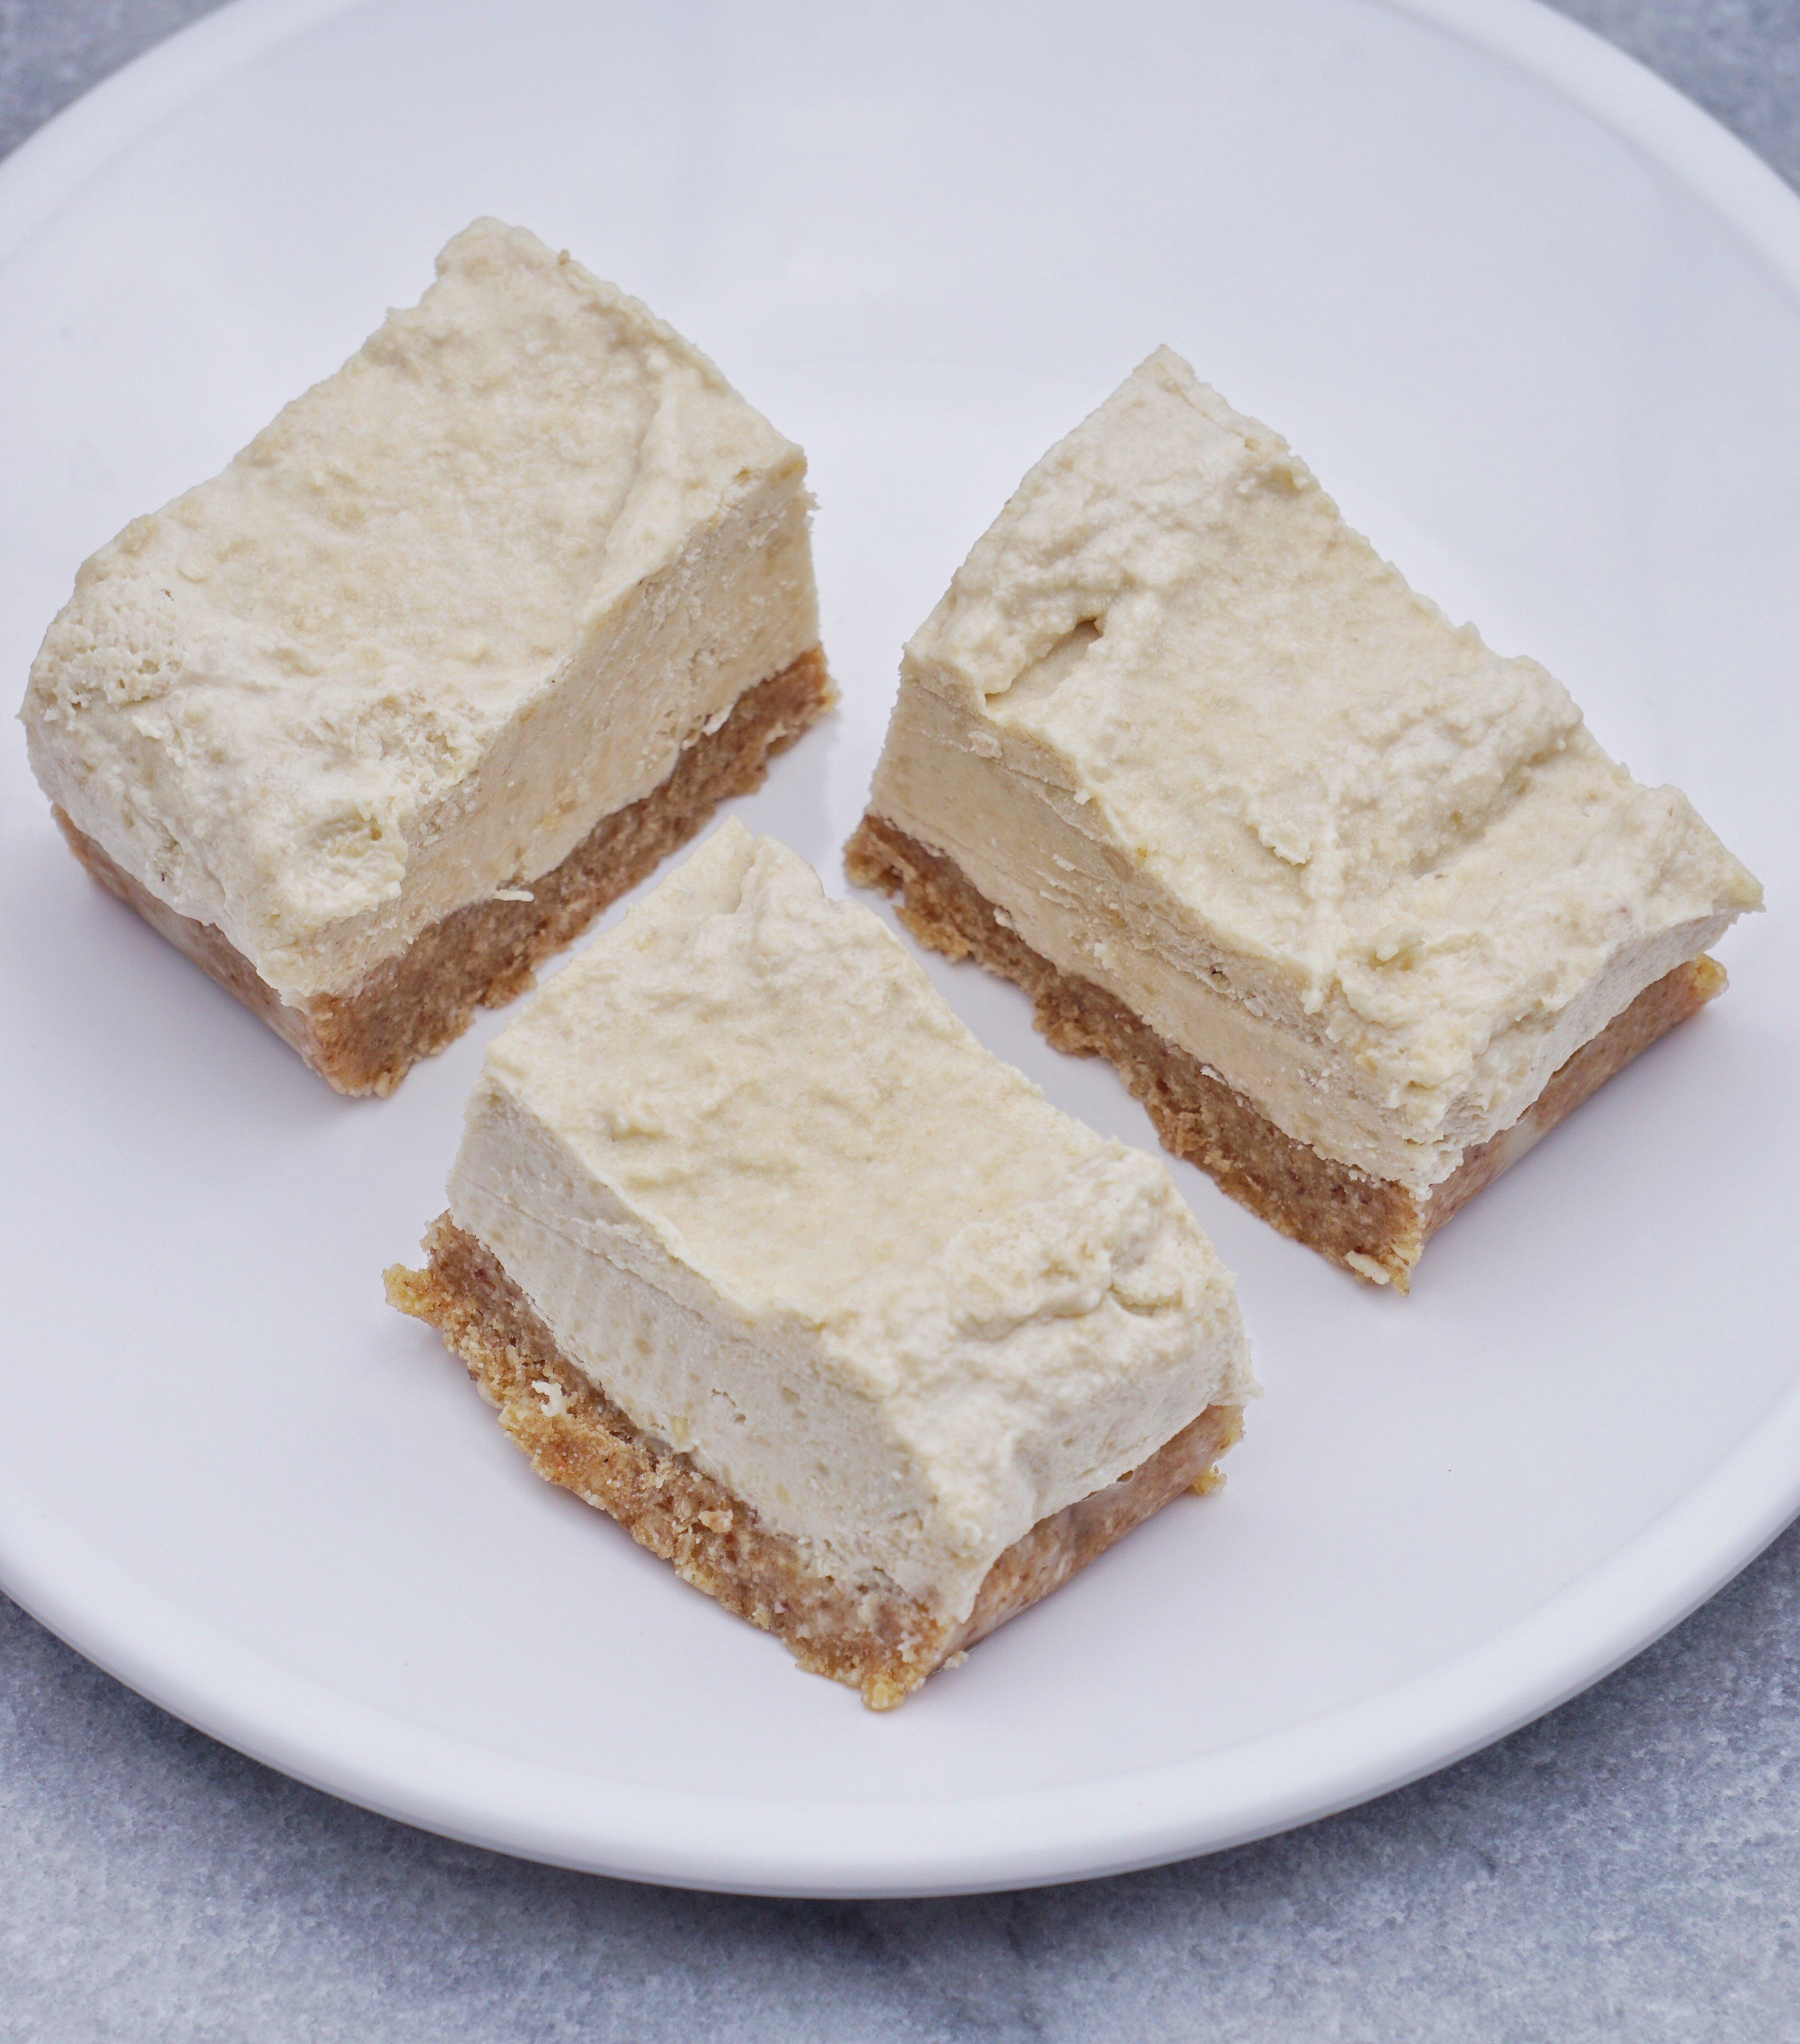 Raw Vegan Cashew Coconut Cheesecake Leahs Plate3 - Raw Vegan Cashew Coconut 'Cheesecake'